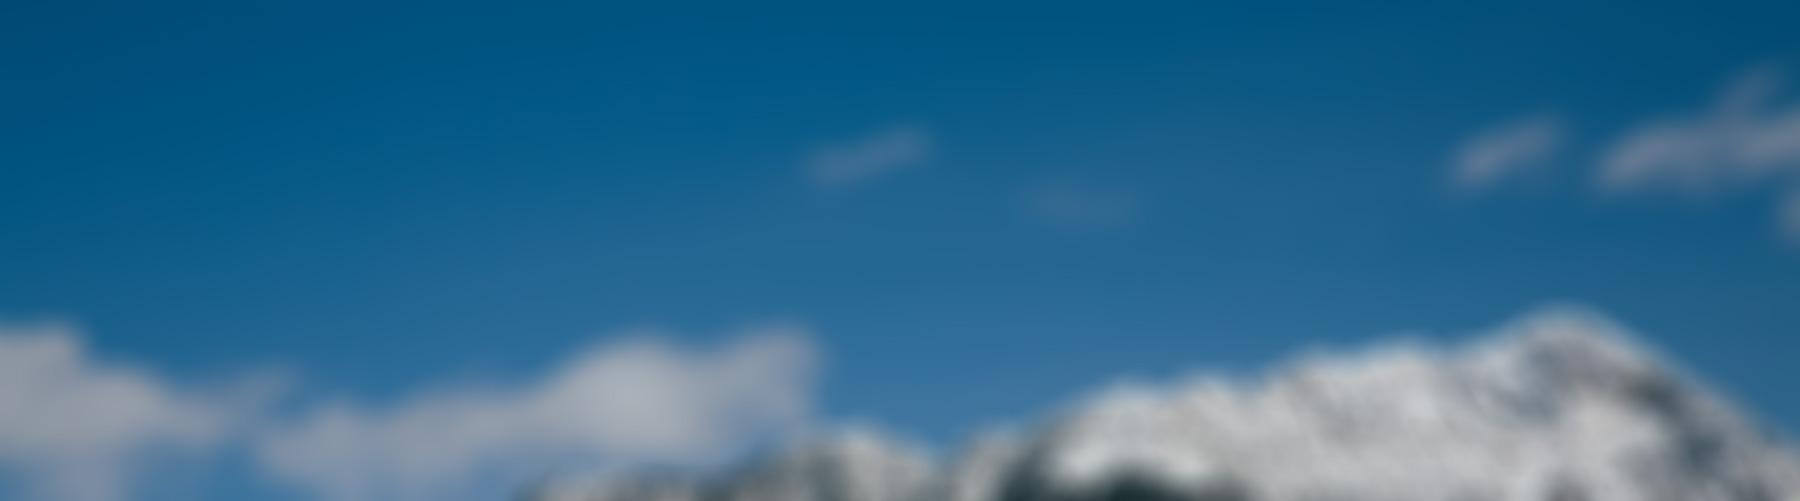 sky_bg